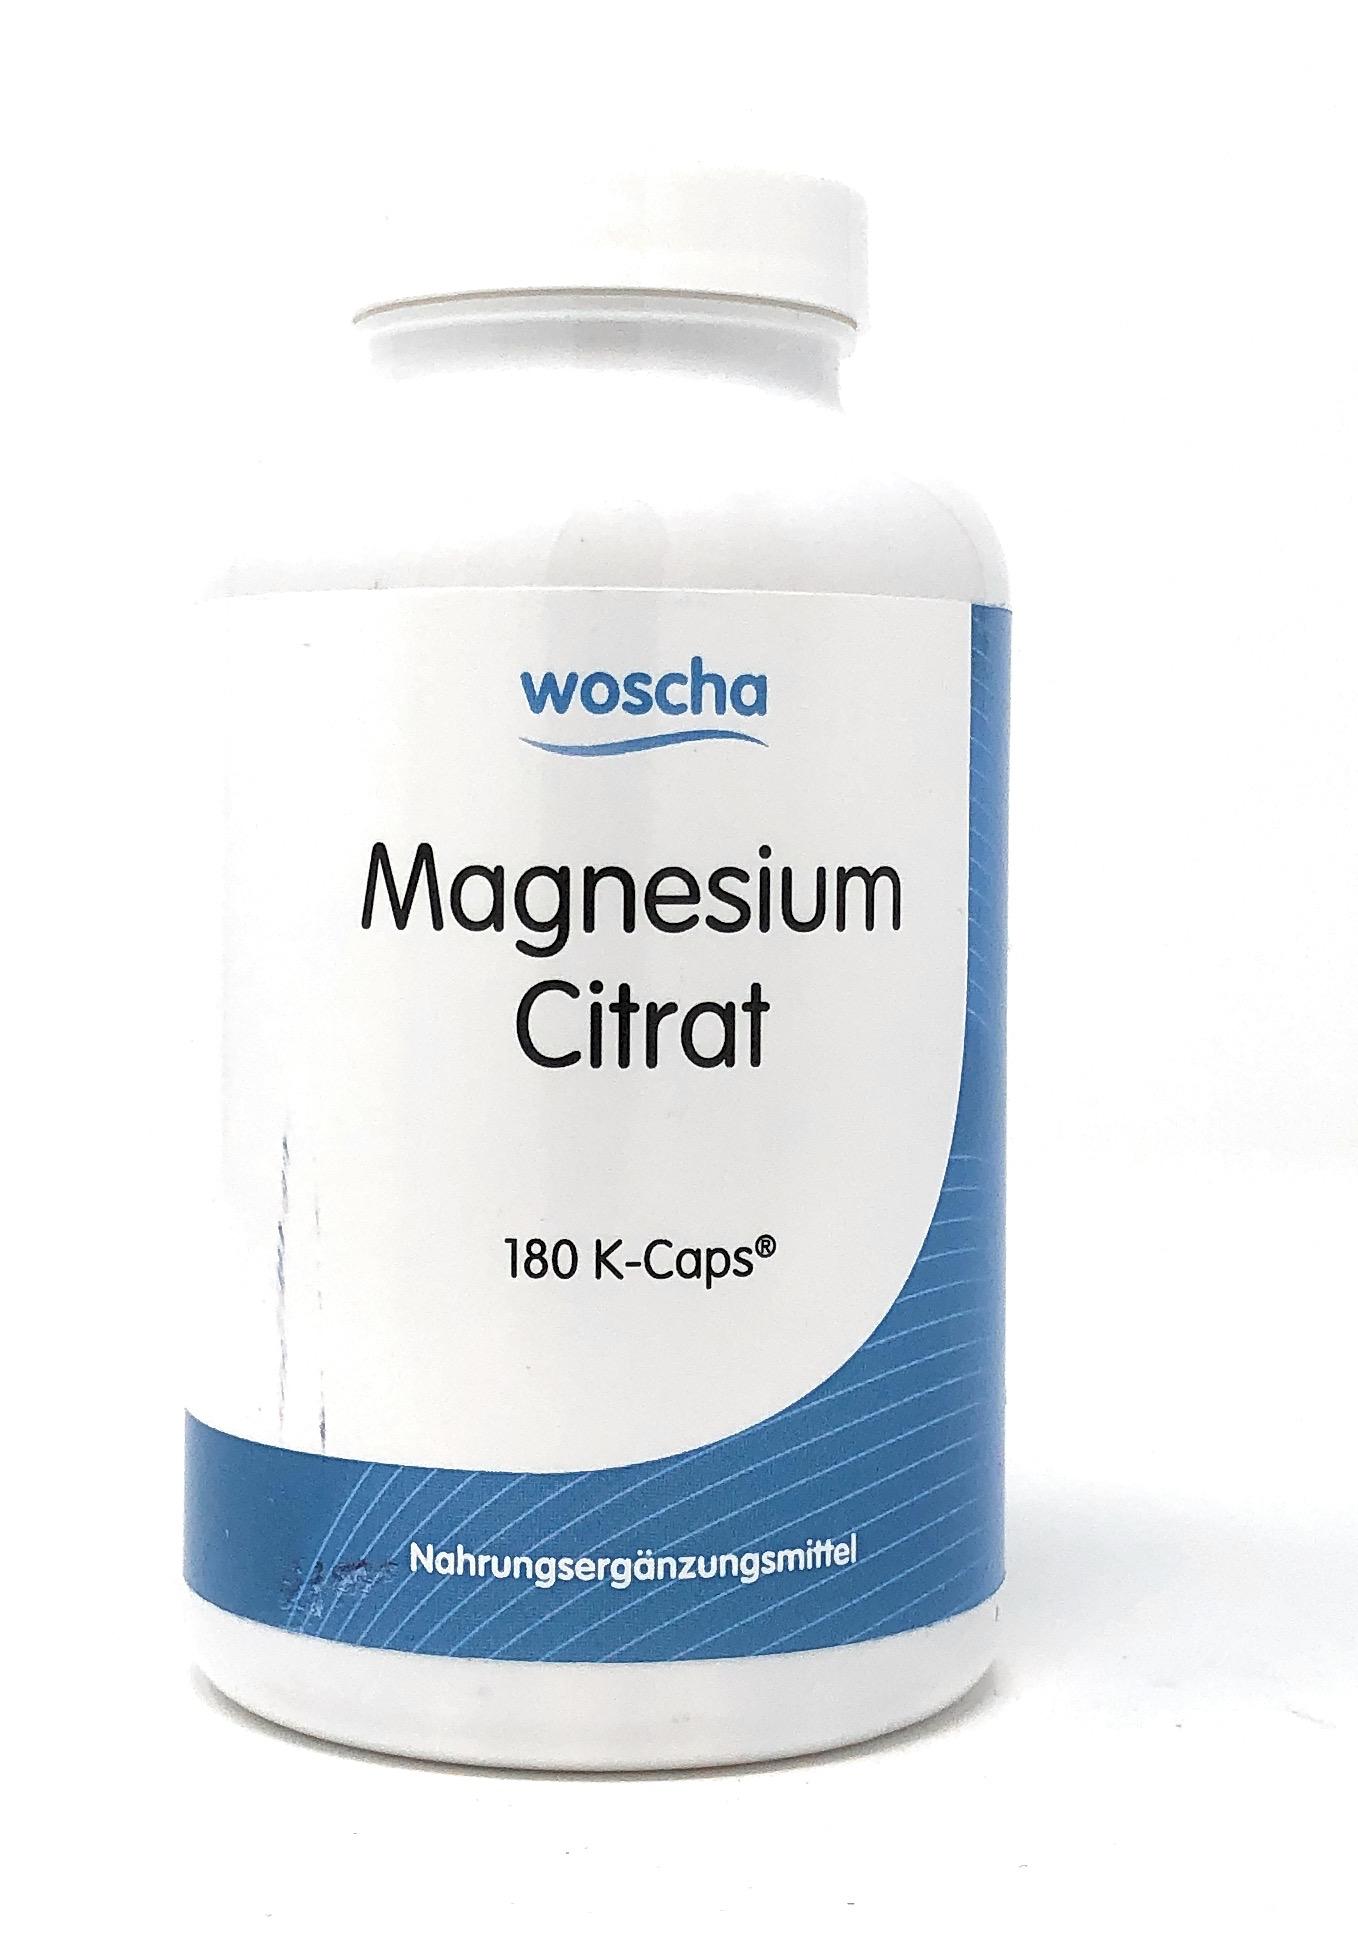 woscha Magnesium Citrat 180 Embo-Caps (181g) (vegan)